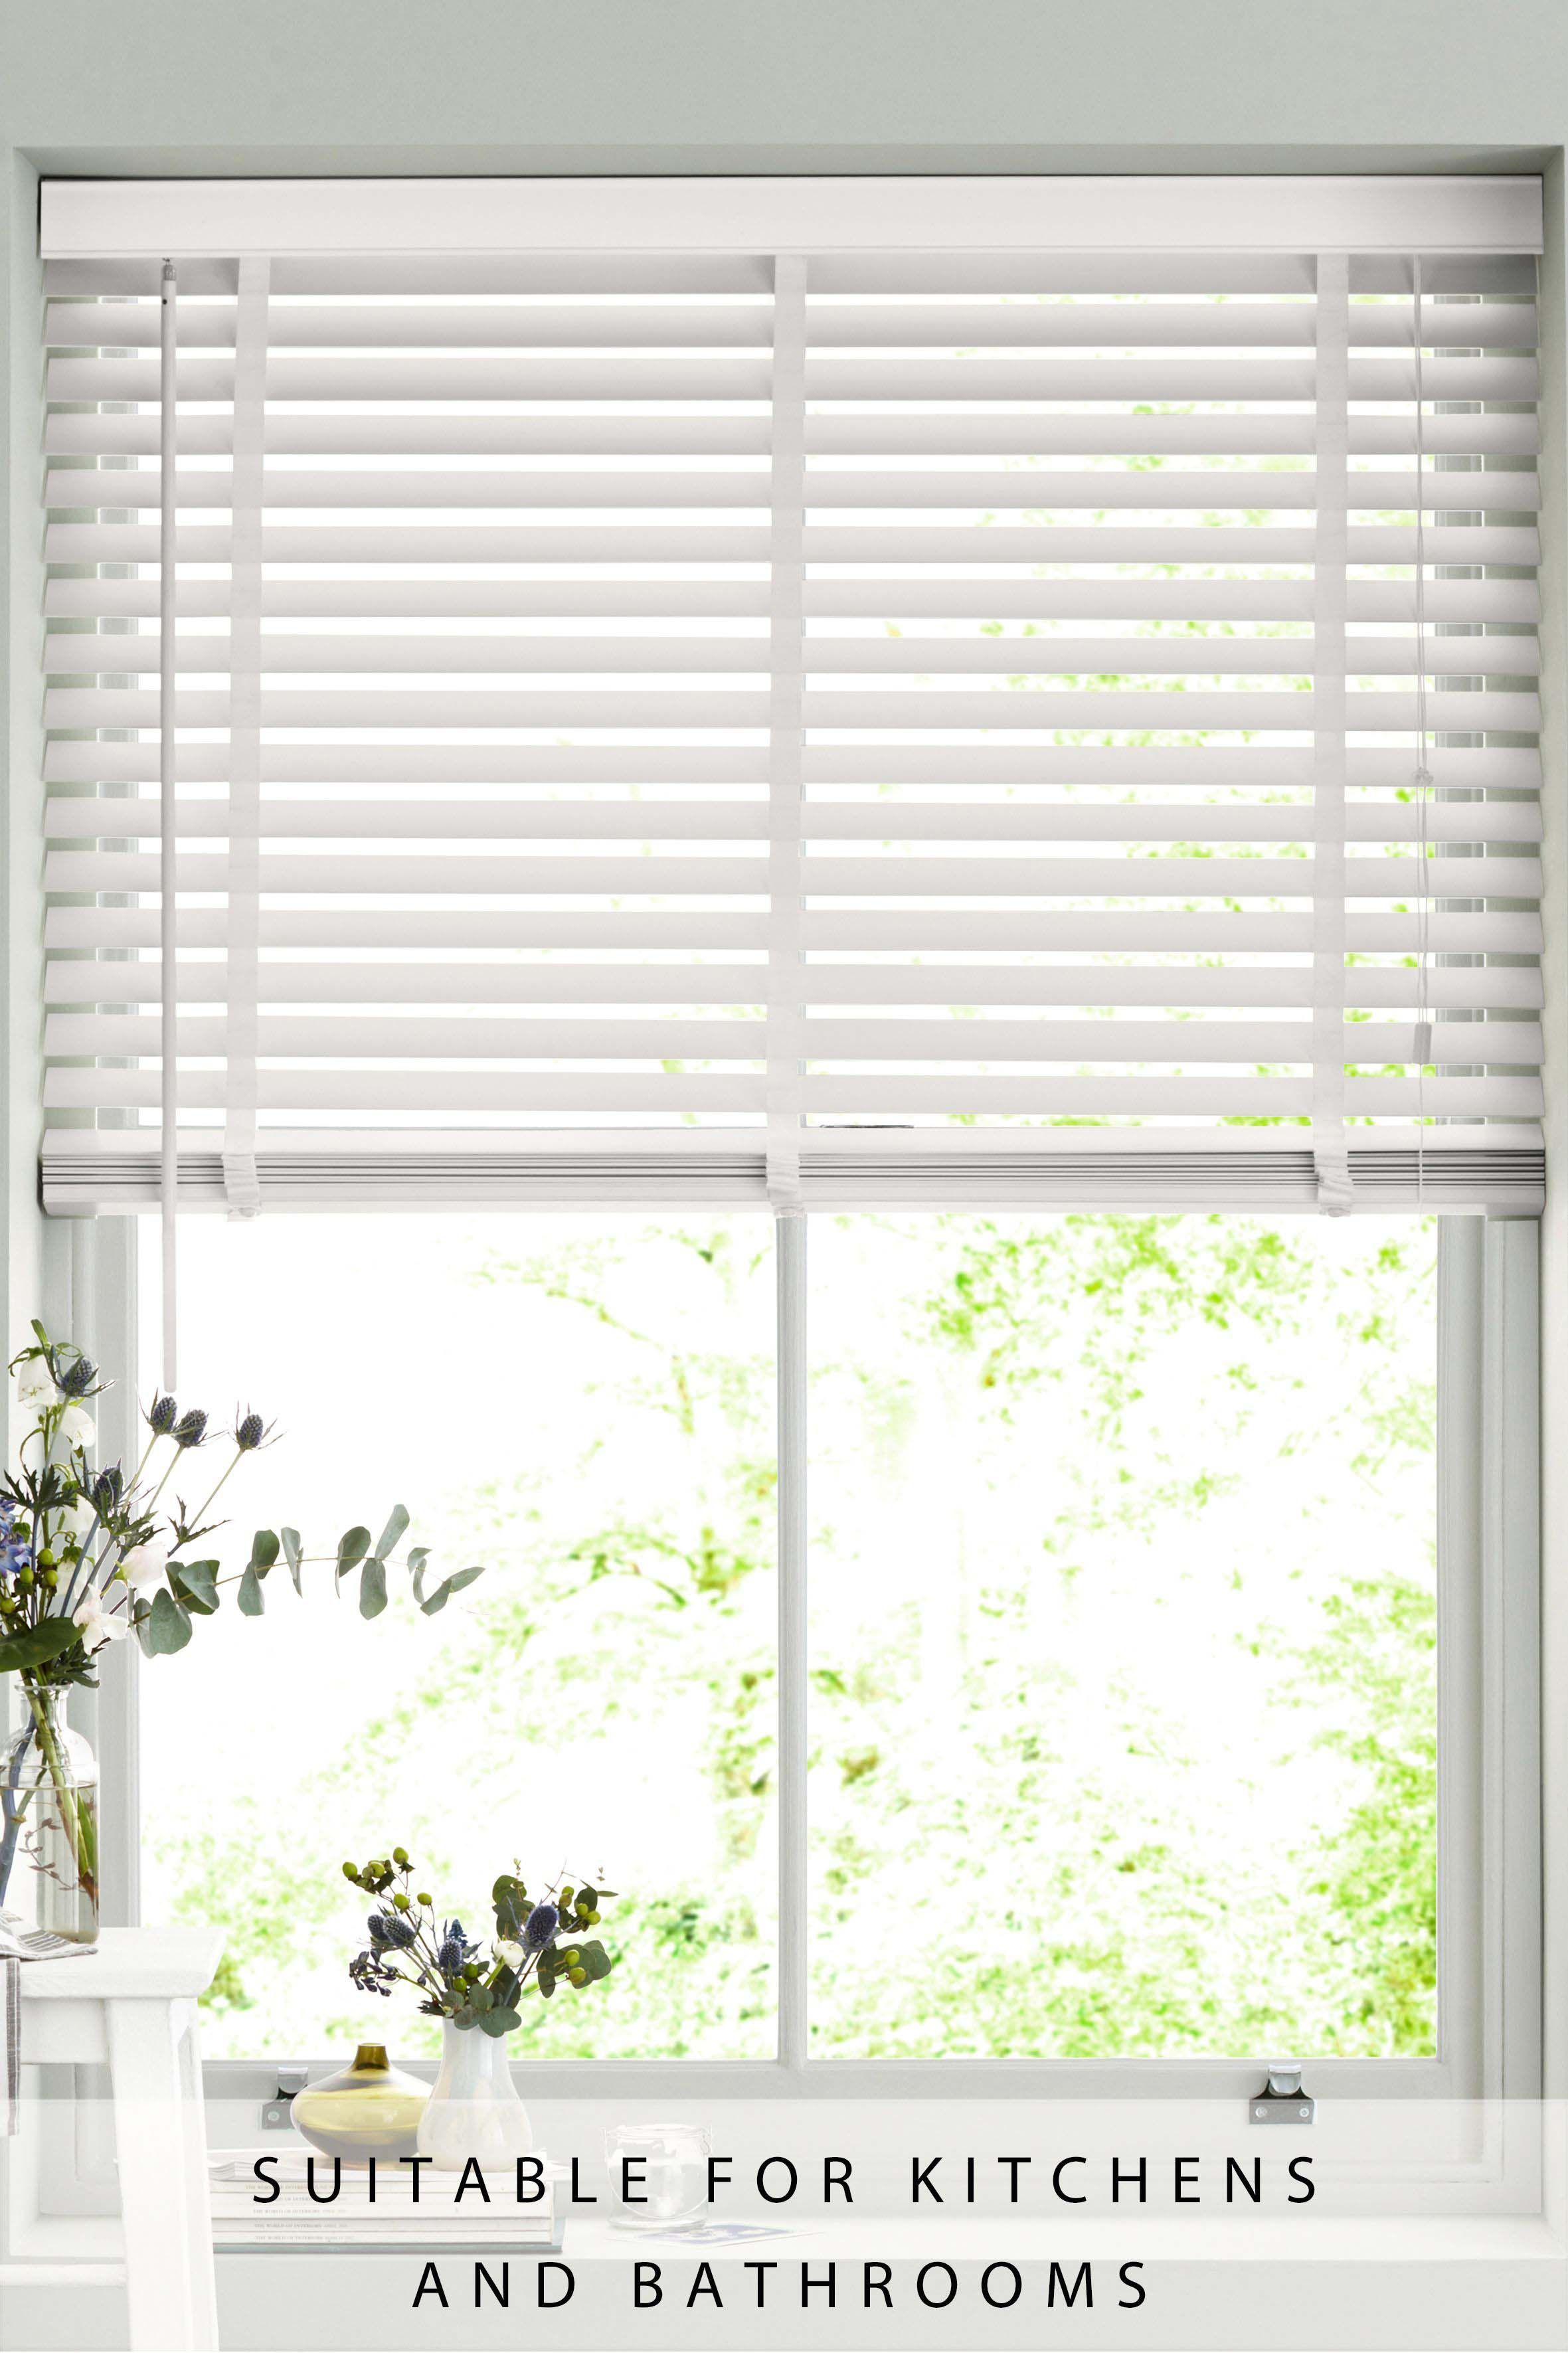 Best No Cost Venetian Blinds Office Strategies In 95 Of Windows Some Type Of Window Dressing To Supply Privacy Sun Protection 2020 Goruntuler Ile Ev Dekorasyonu Evler Dekorasyon